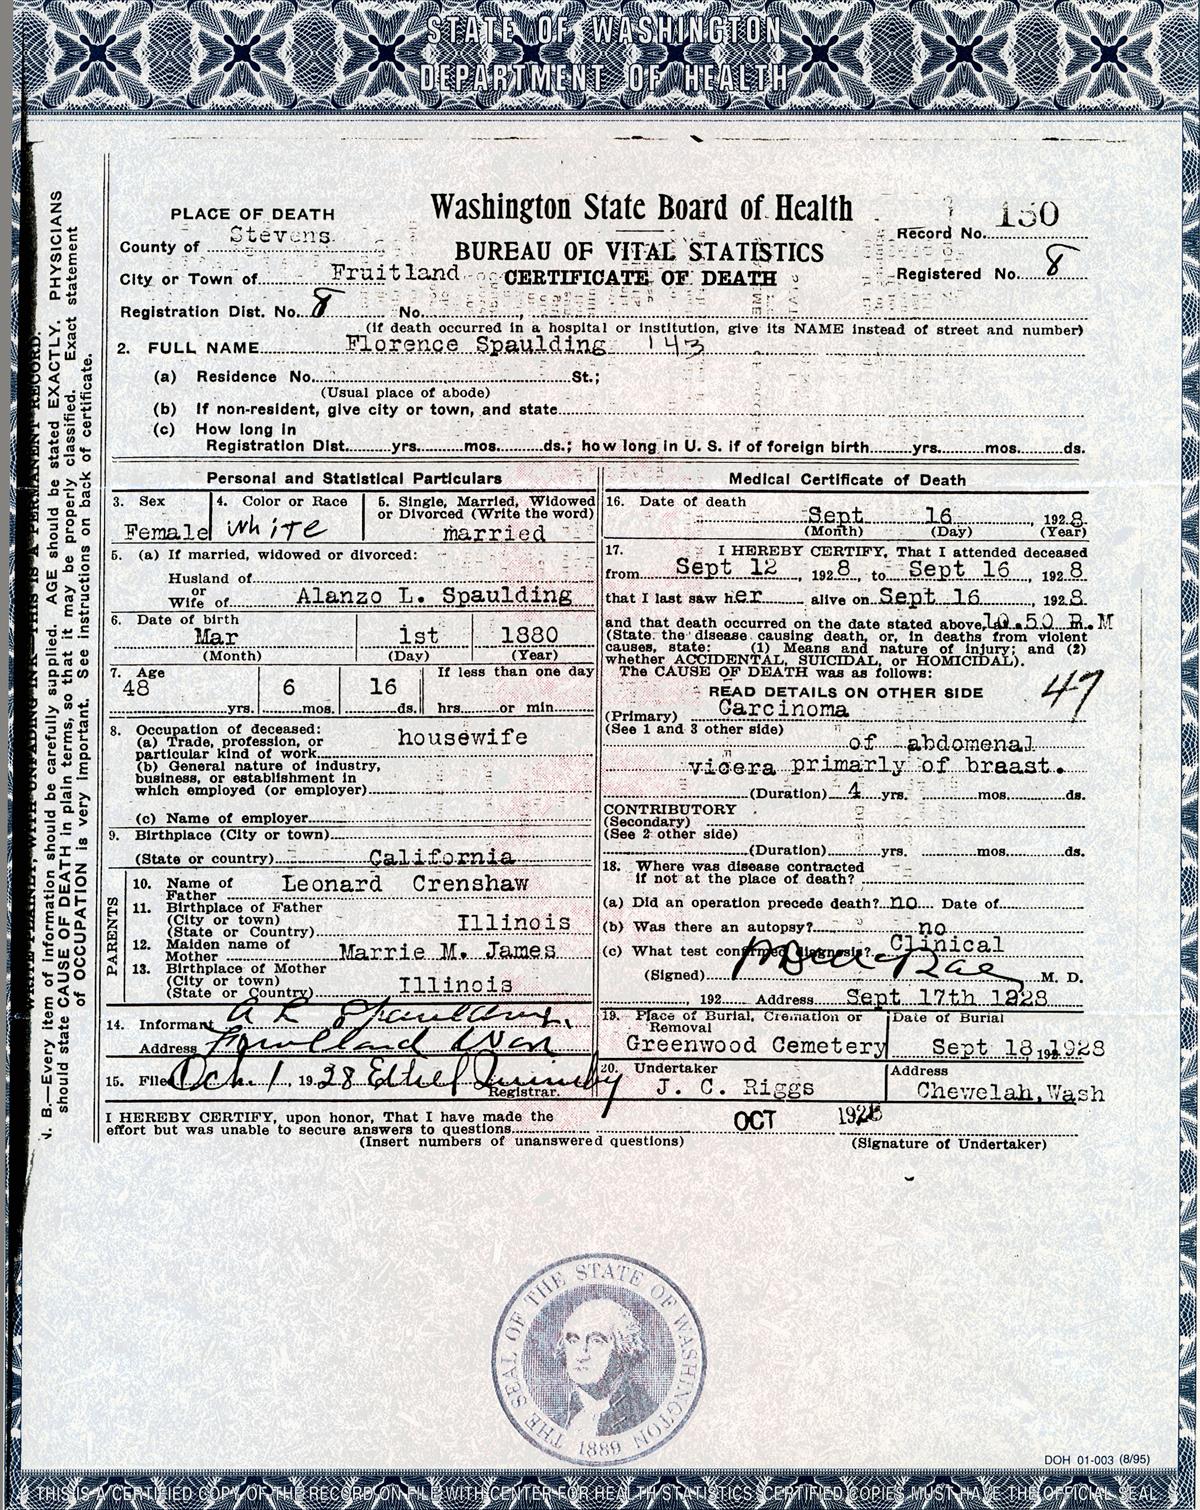 Documents Crenshaw Florence Crenshaw Spaulding Death